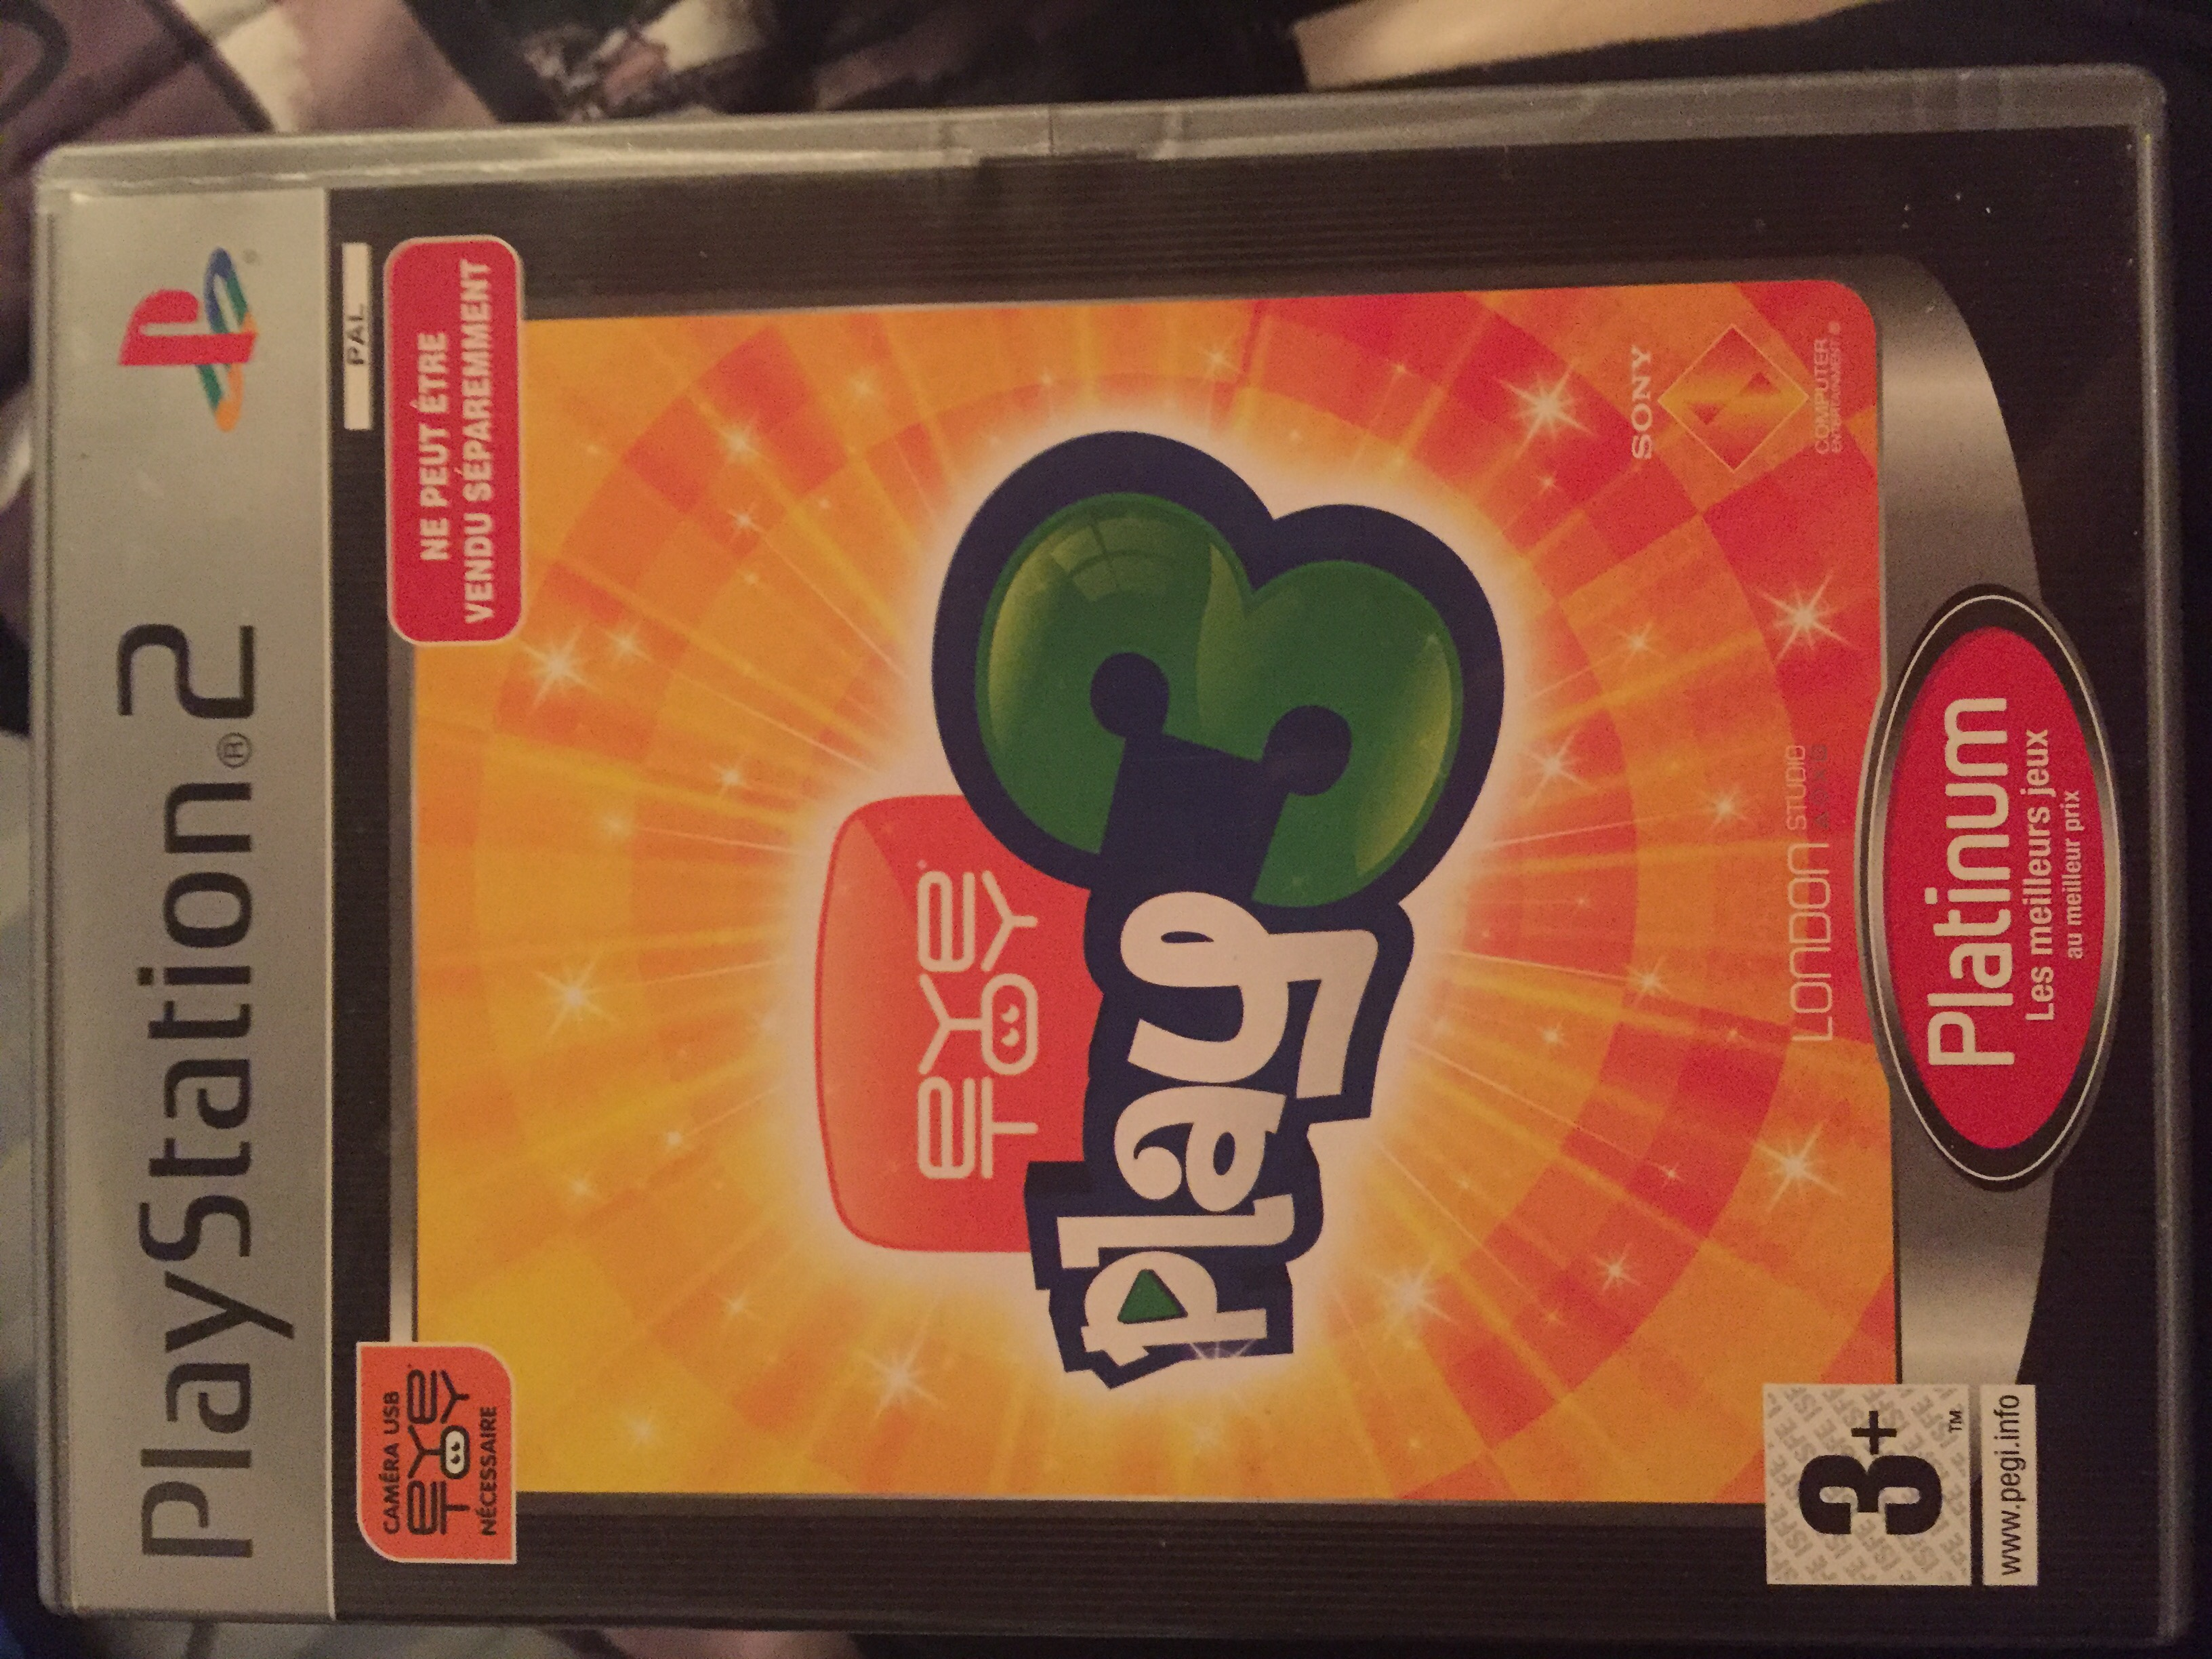 Jeu PS2 Eye Toy Play 3   Caméra 8 Alfortville (94)